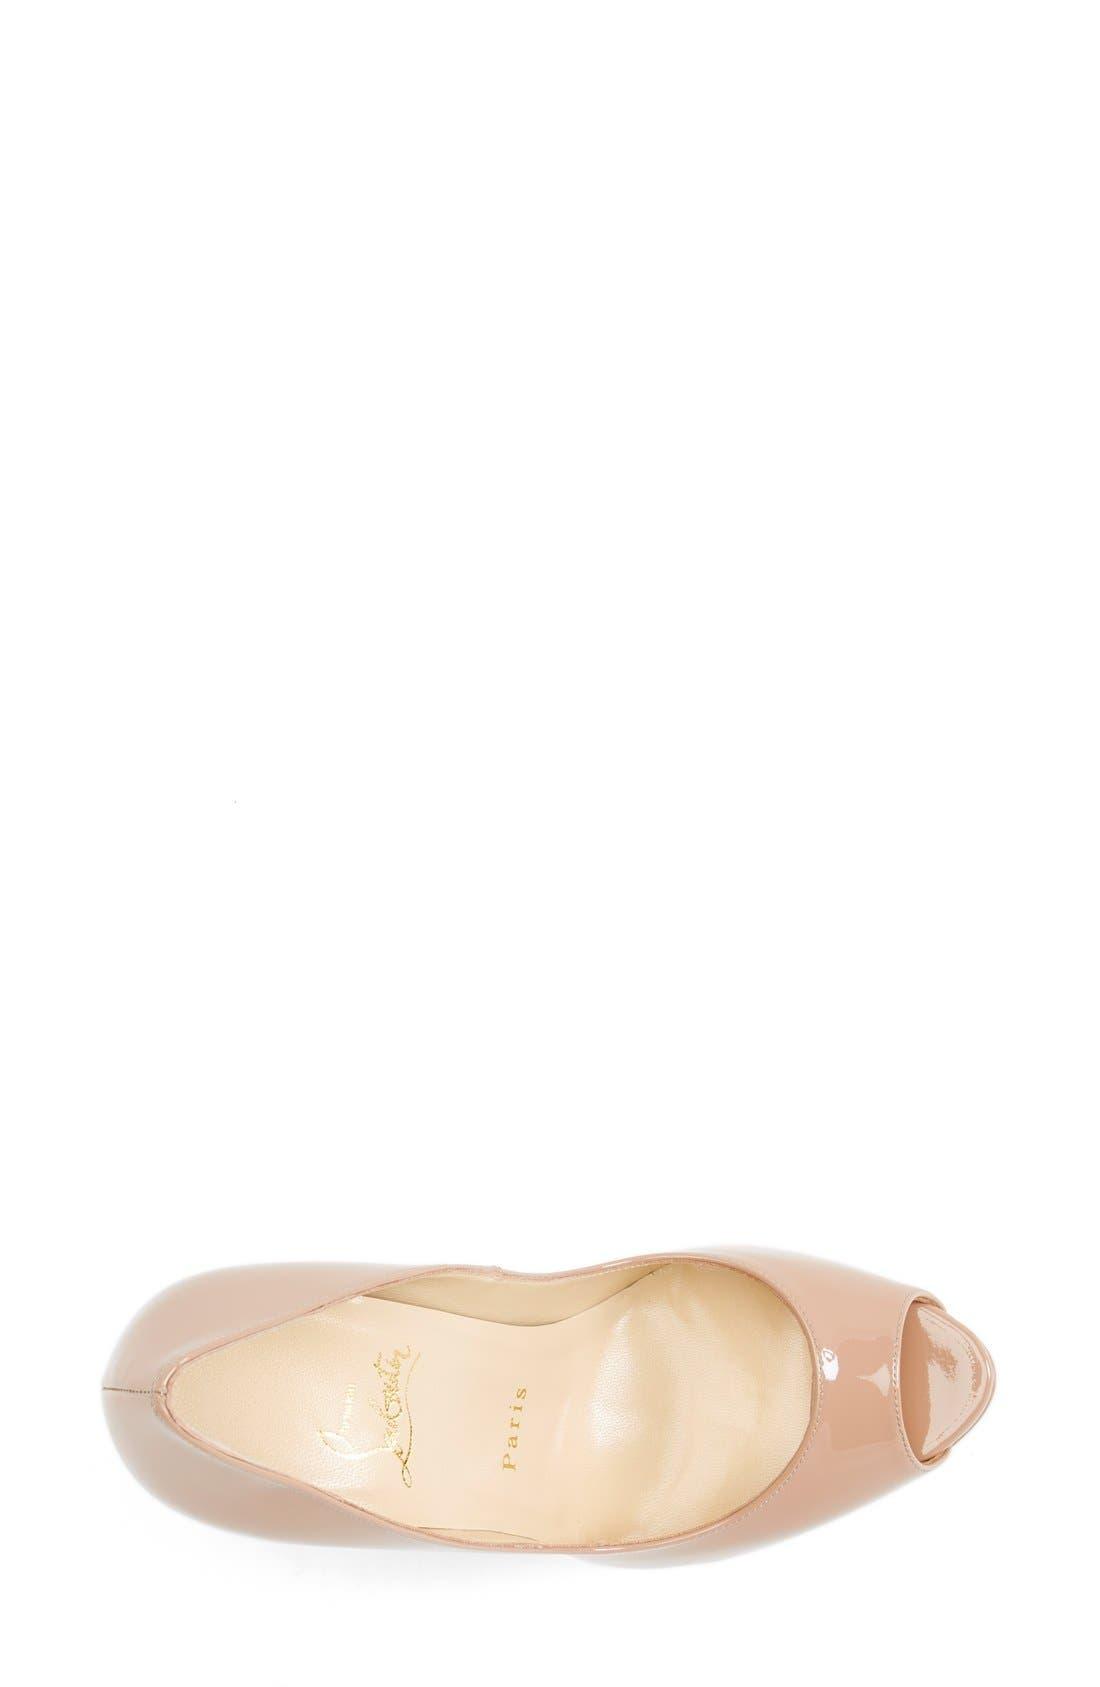 Alternate Image 3  - Christian Louboutin 'Lady Peep' Open Toe Pump